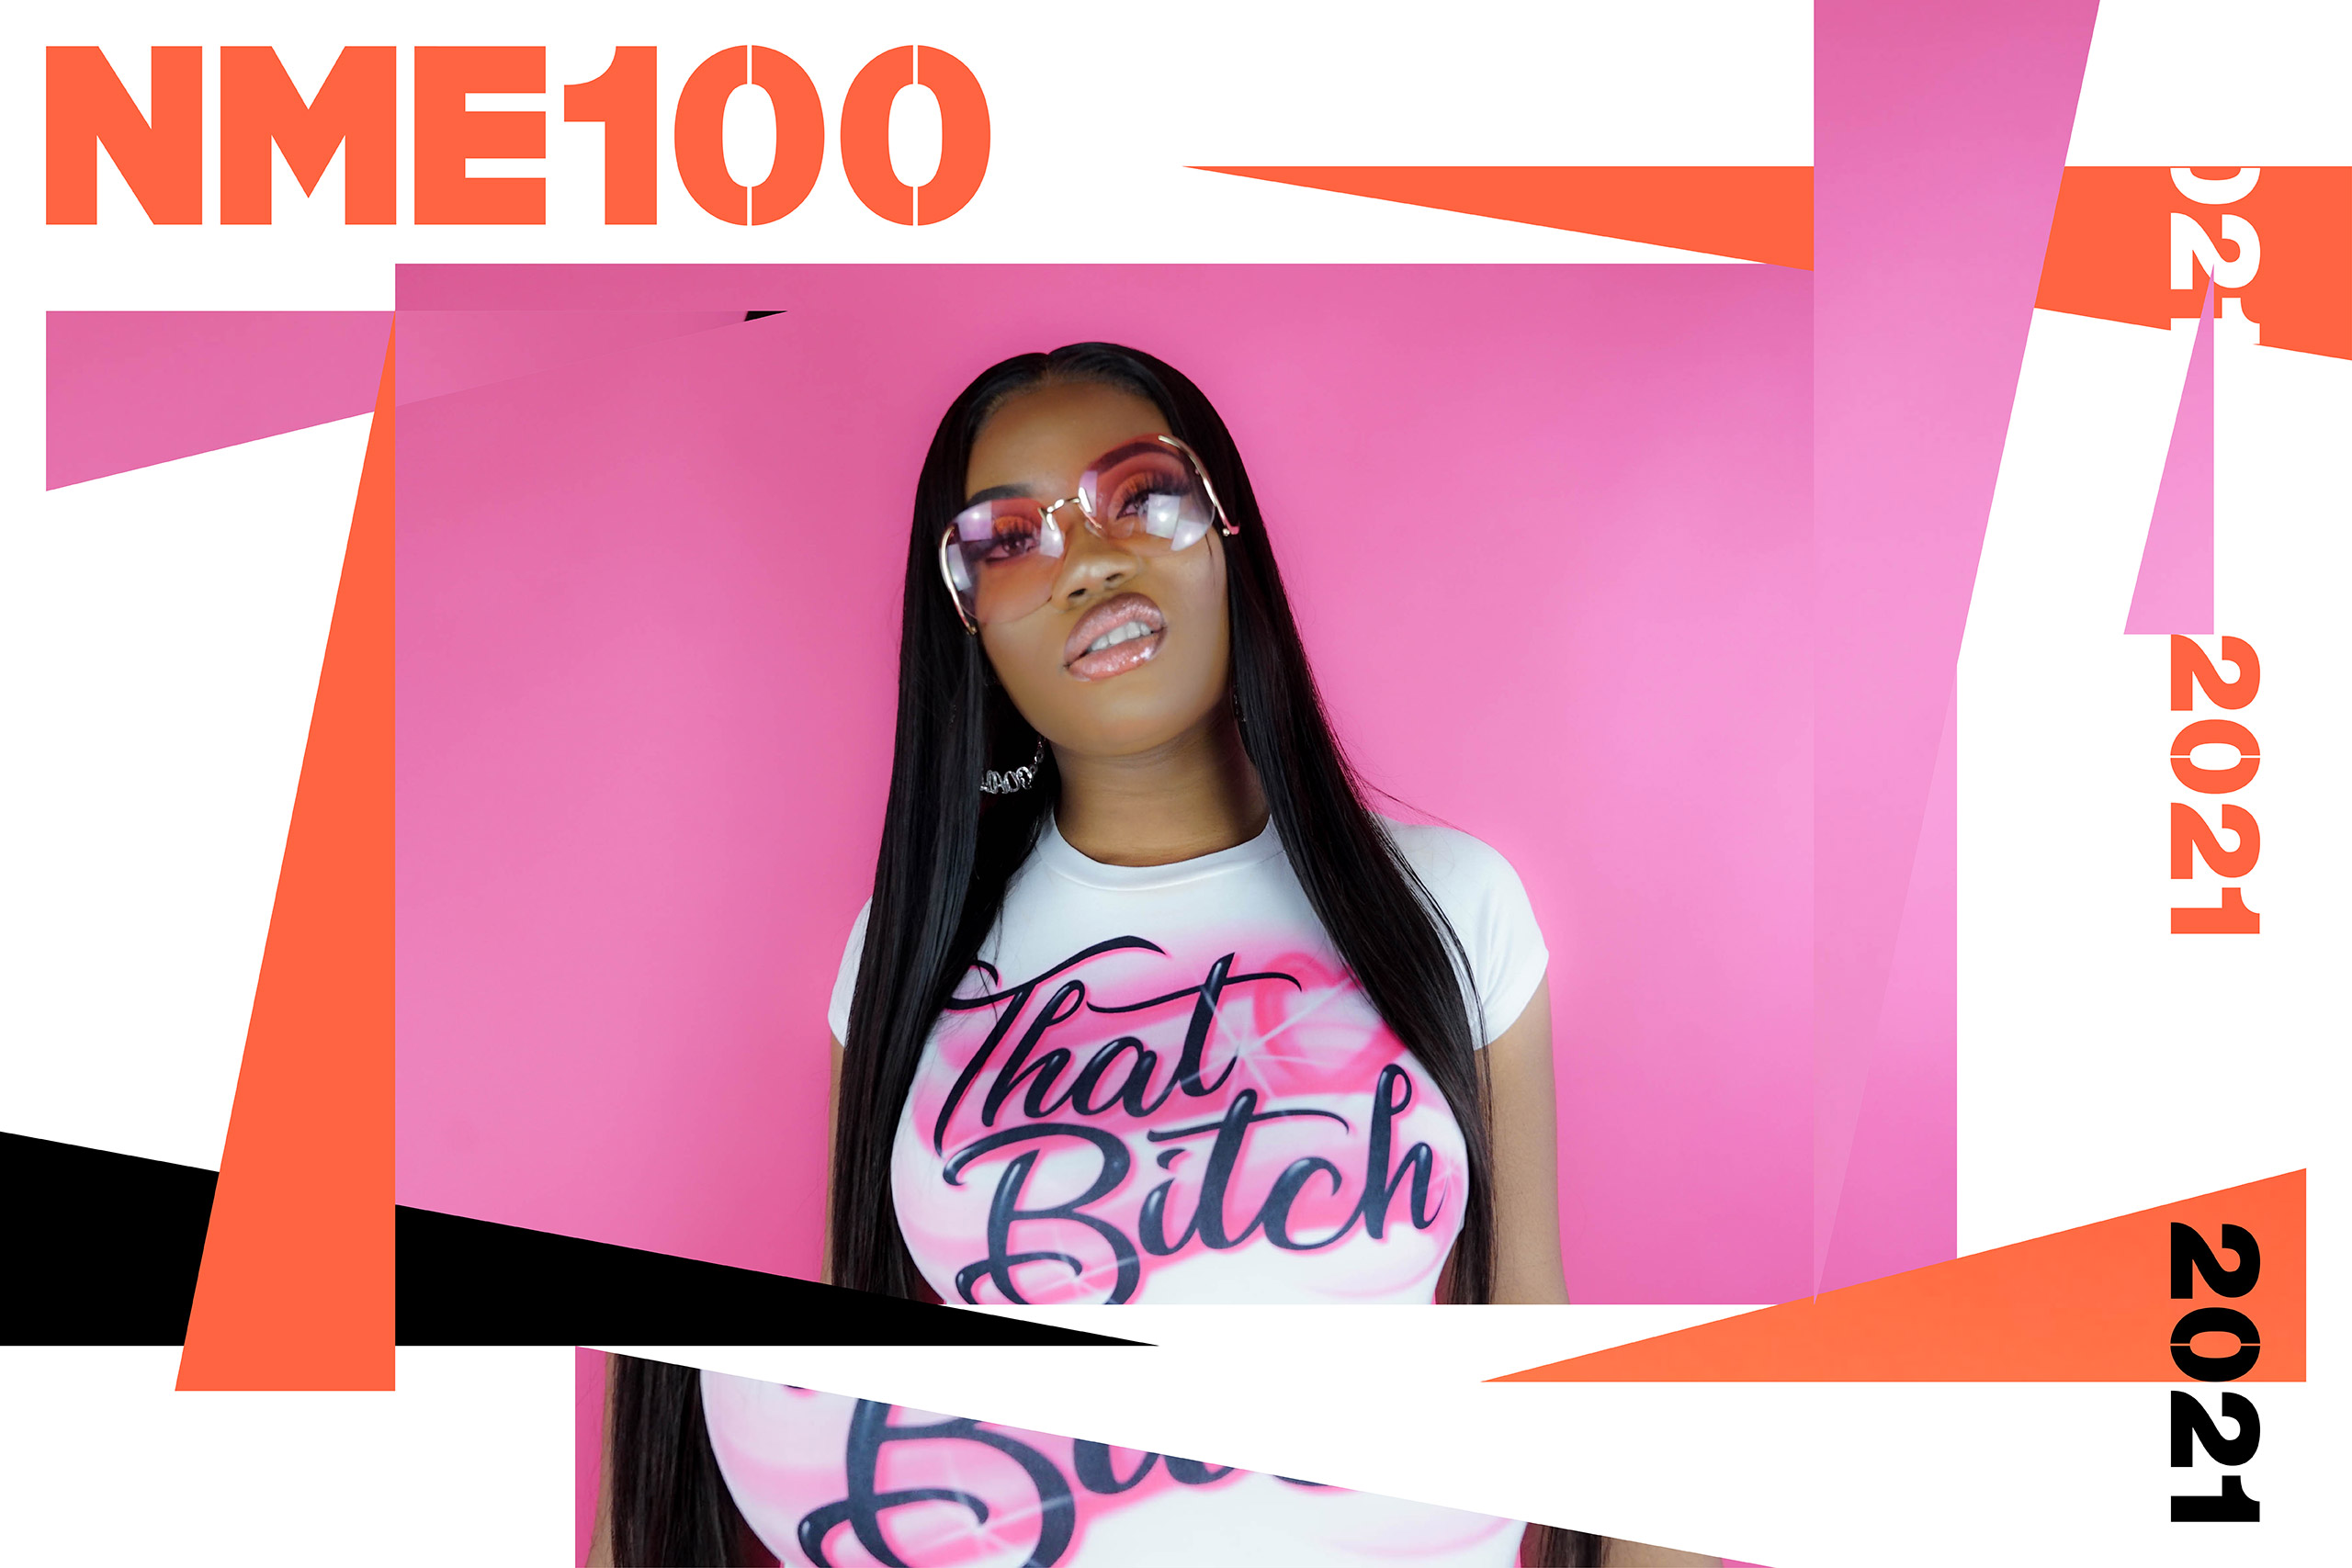 NME 100 shaybo